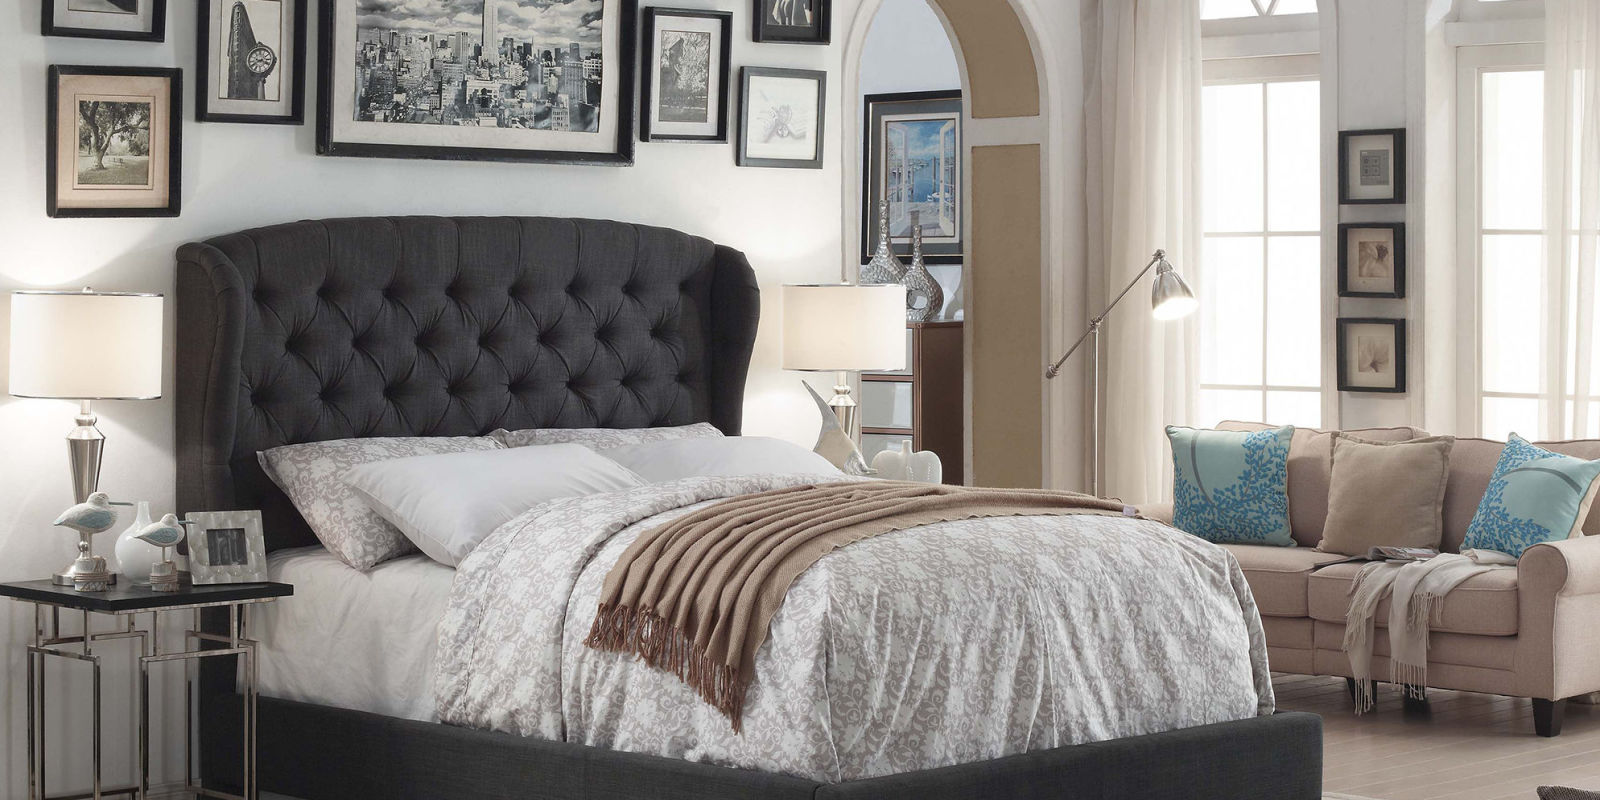 11 Best Joss And Main Home Decor 2017   Joss U0026 Main Furniture And Decor